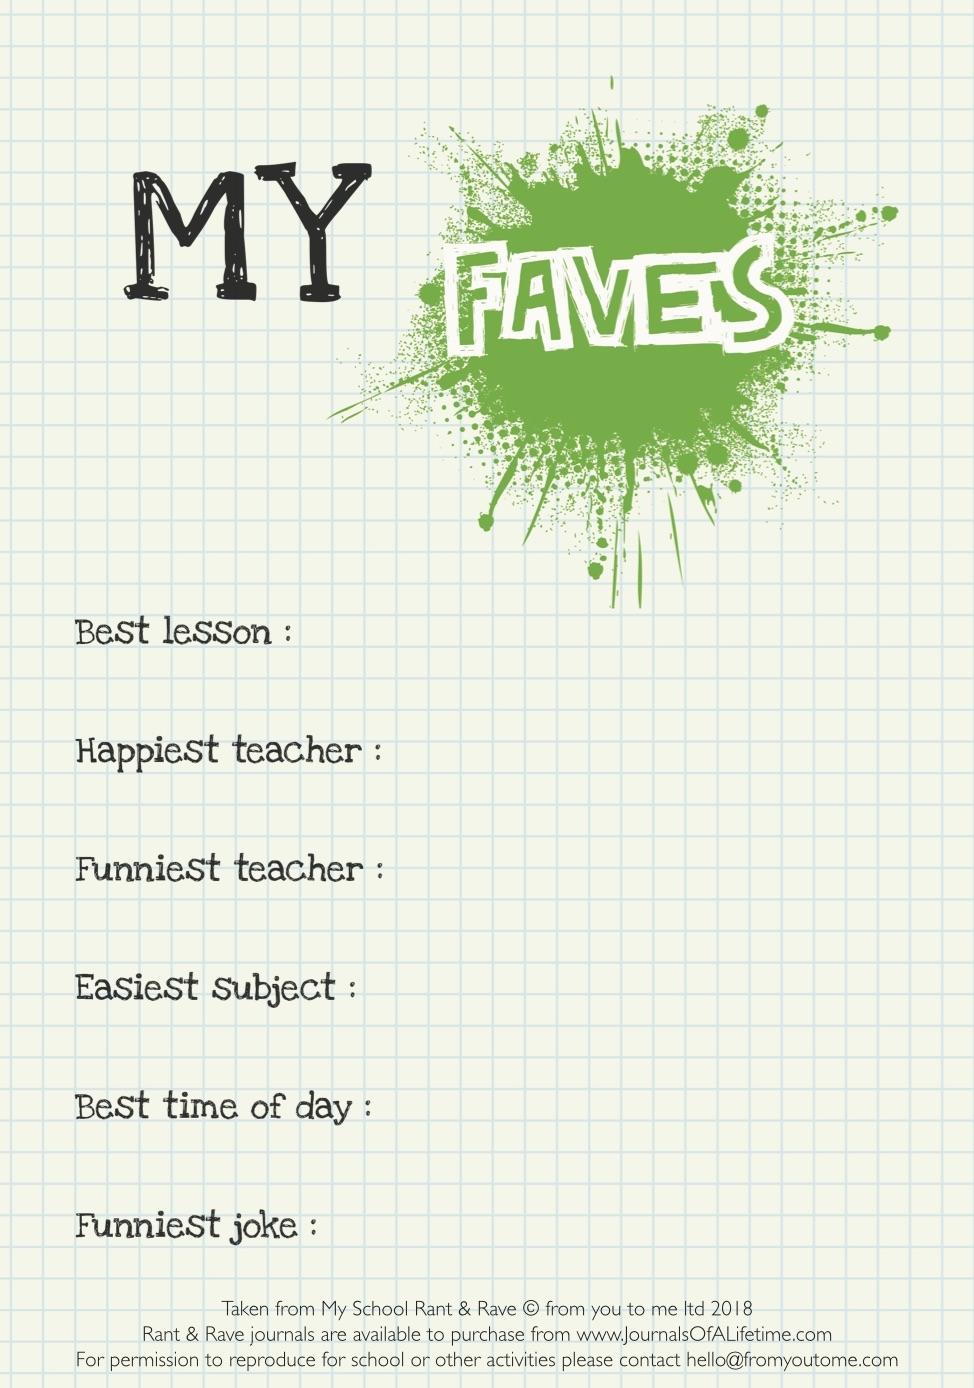 My School - My Faves